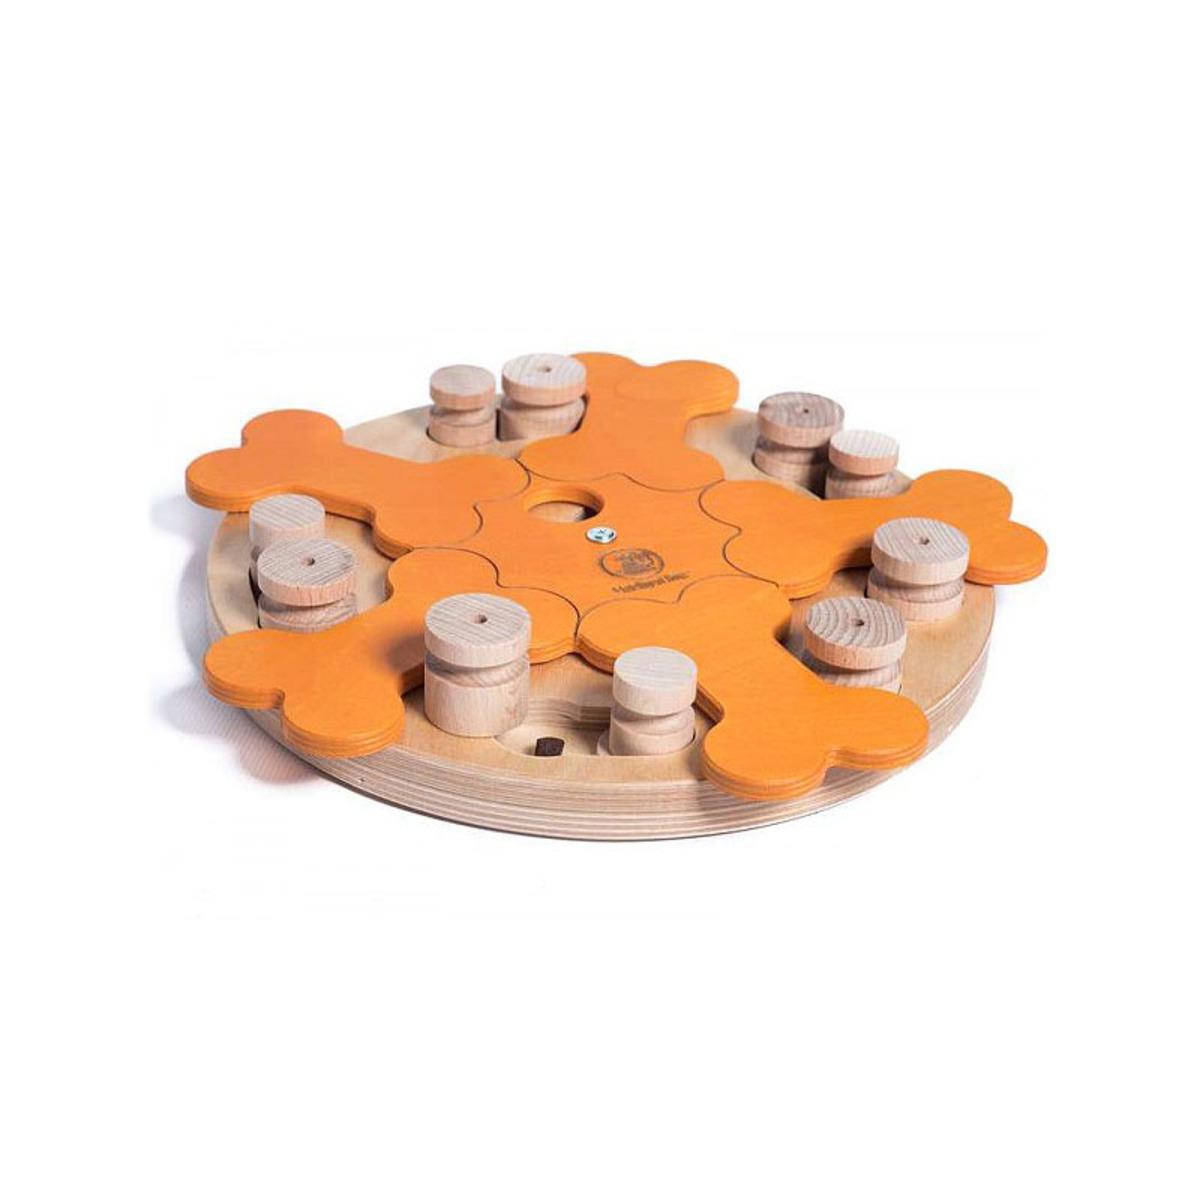 Carousel of Bones - Pet Interactive Toy